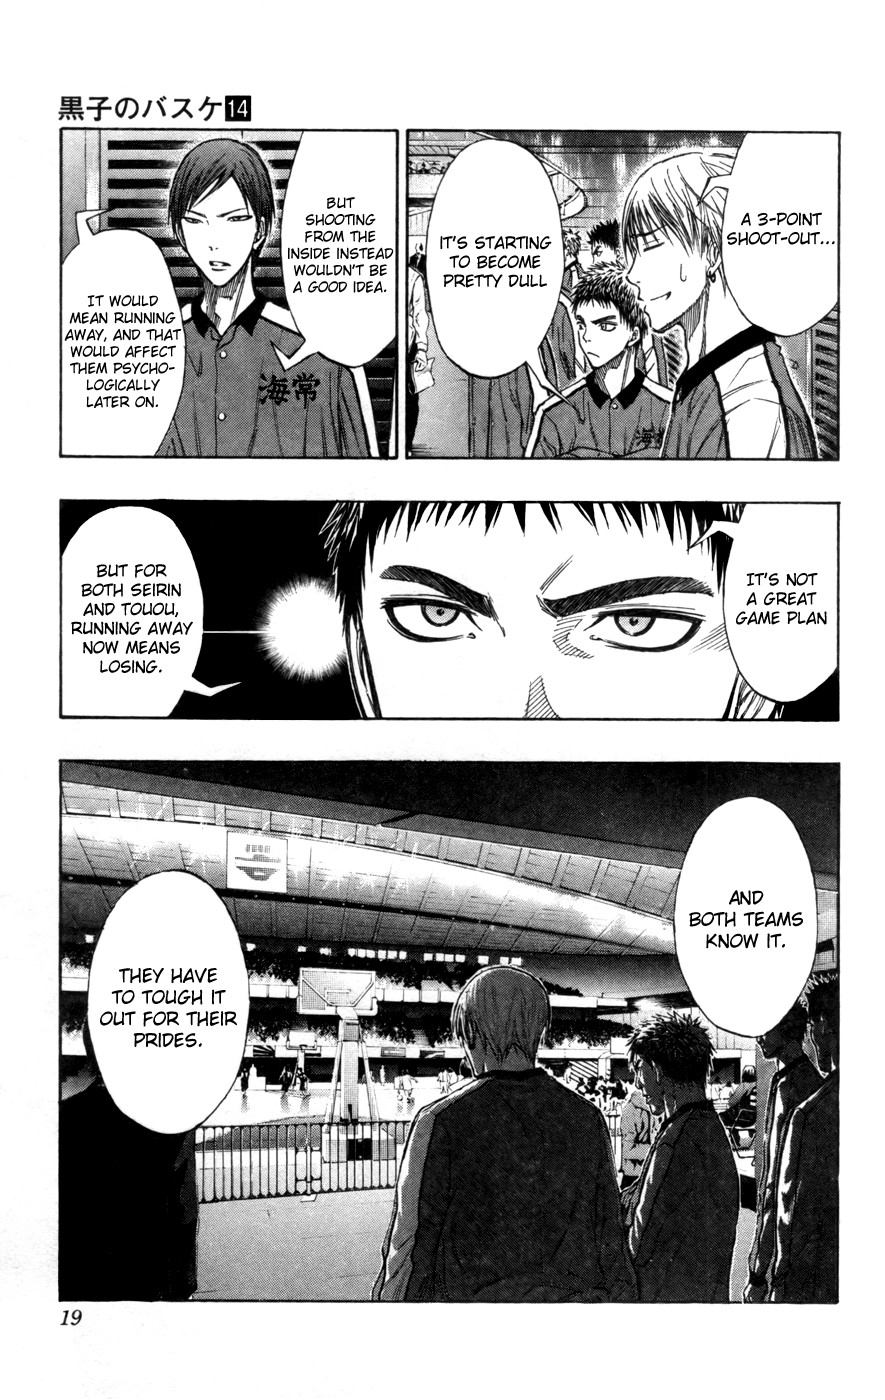 Kuroko no Basket Manga Chapter 118 - Image 4_019